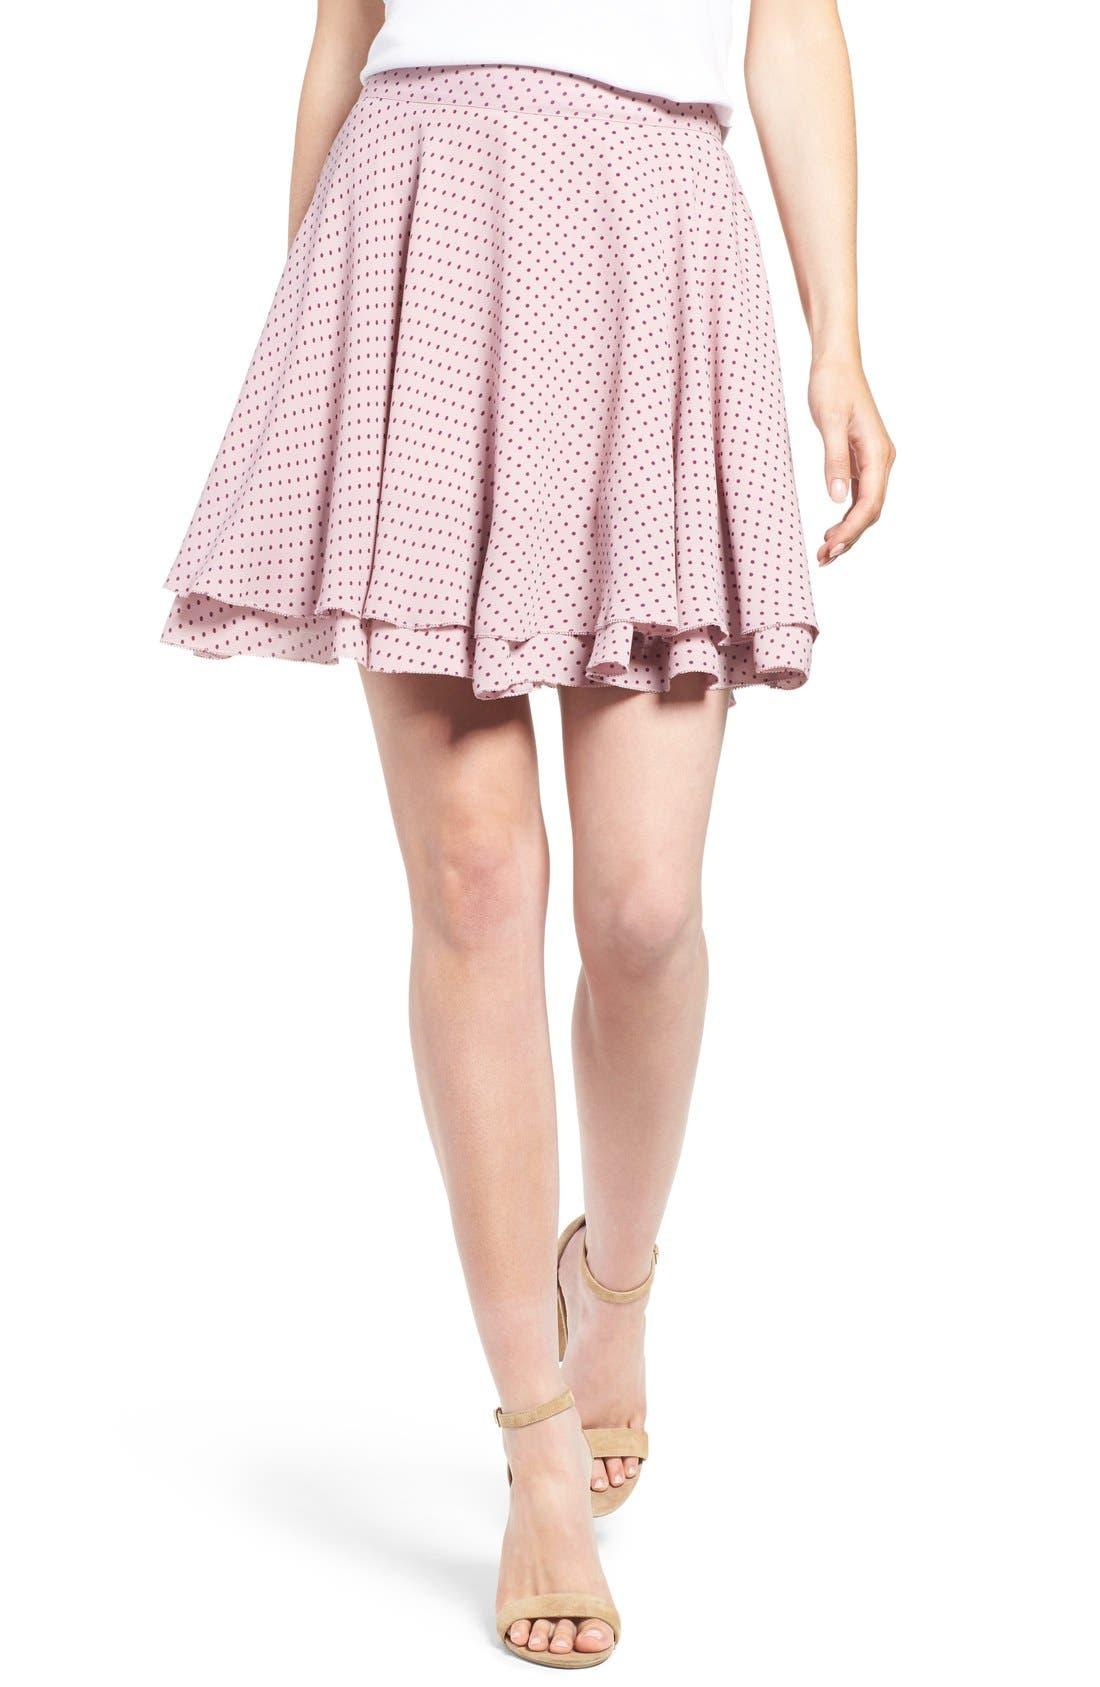 Alternate Image 1 Selected - Rebecca Minkoff 'Bellamar' Polka Dot Miniskirt